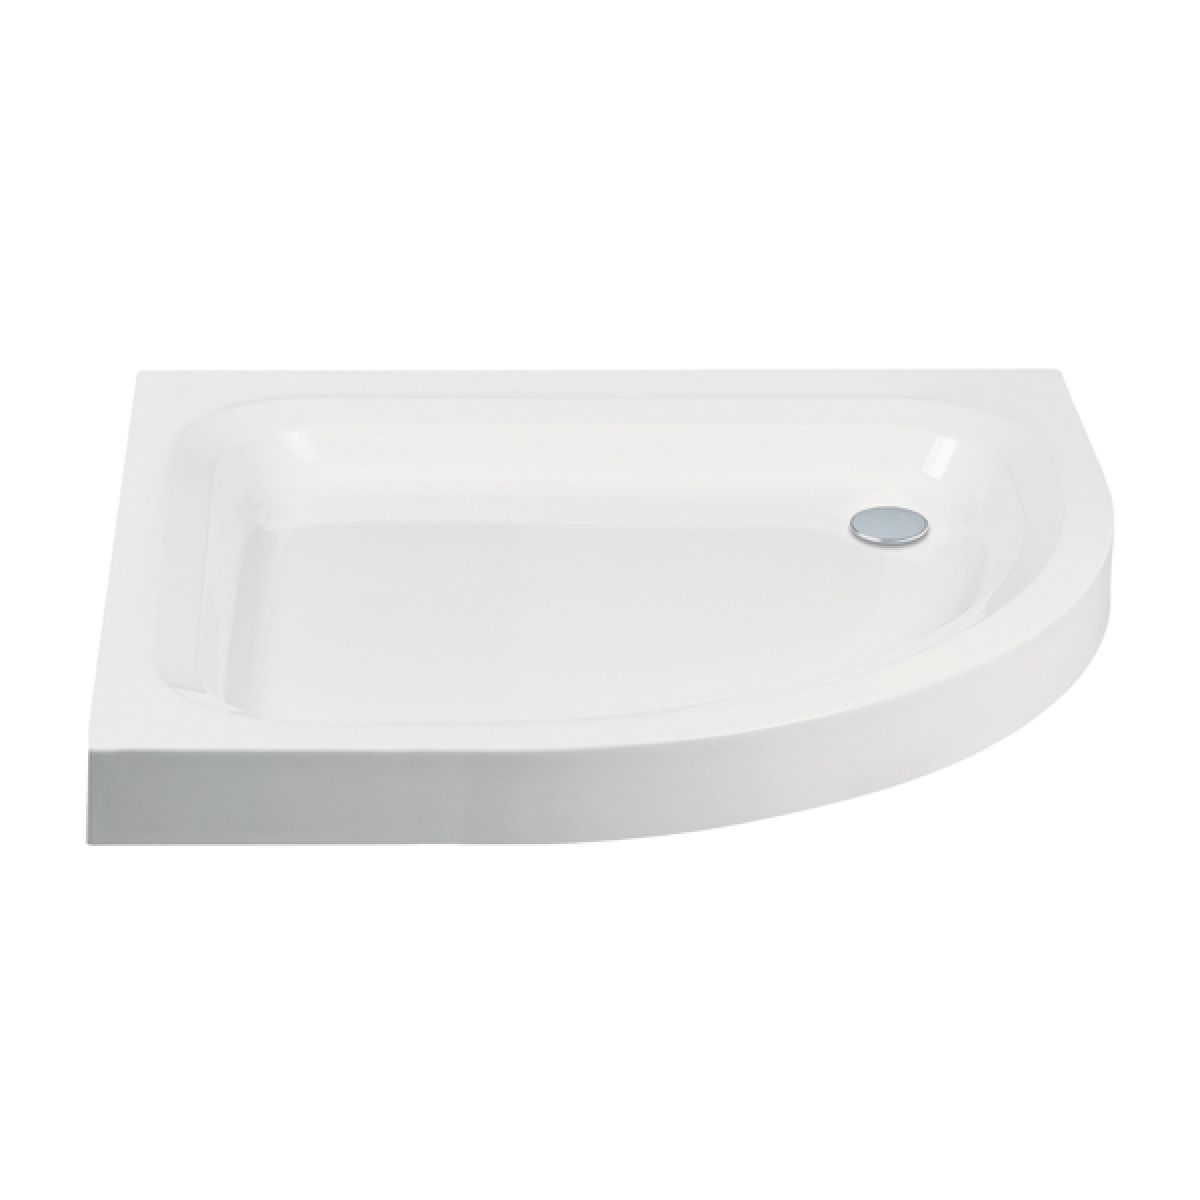 Frontline Standard Offset Quadrant Shower Tray 900 x 760mm Right Handed